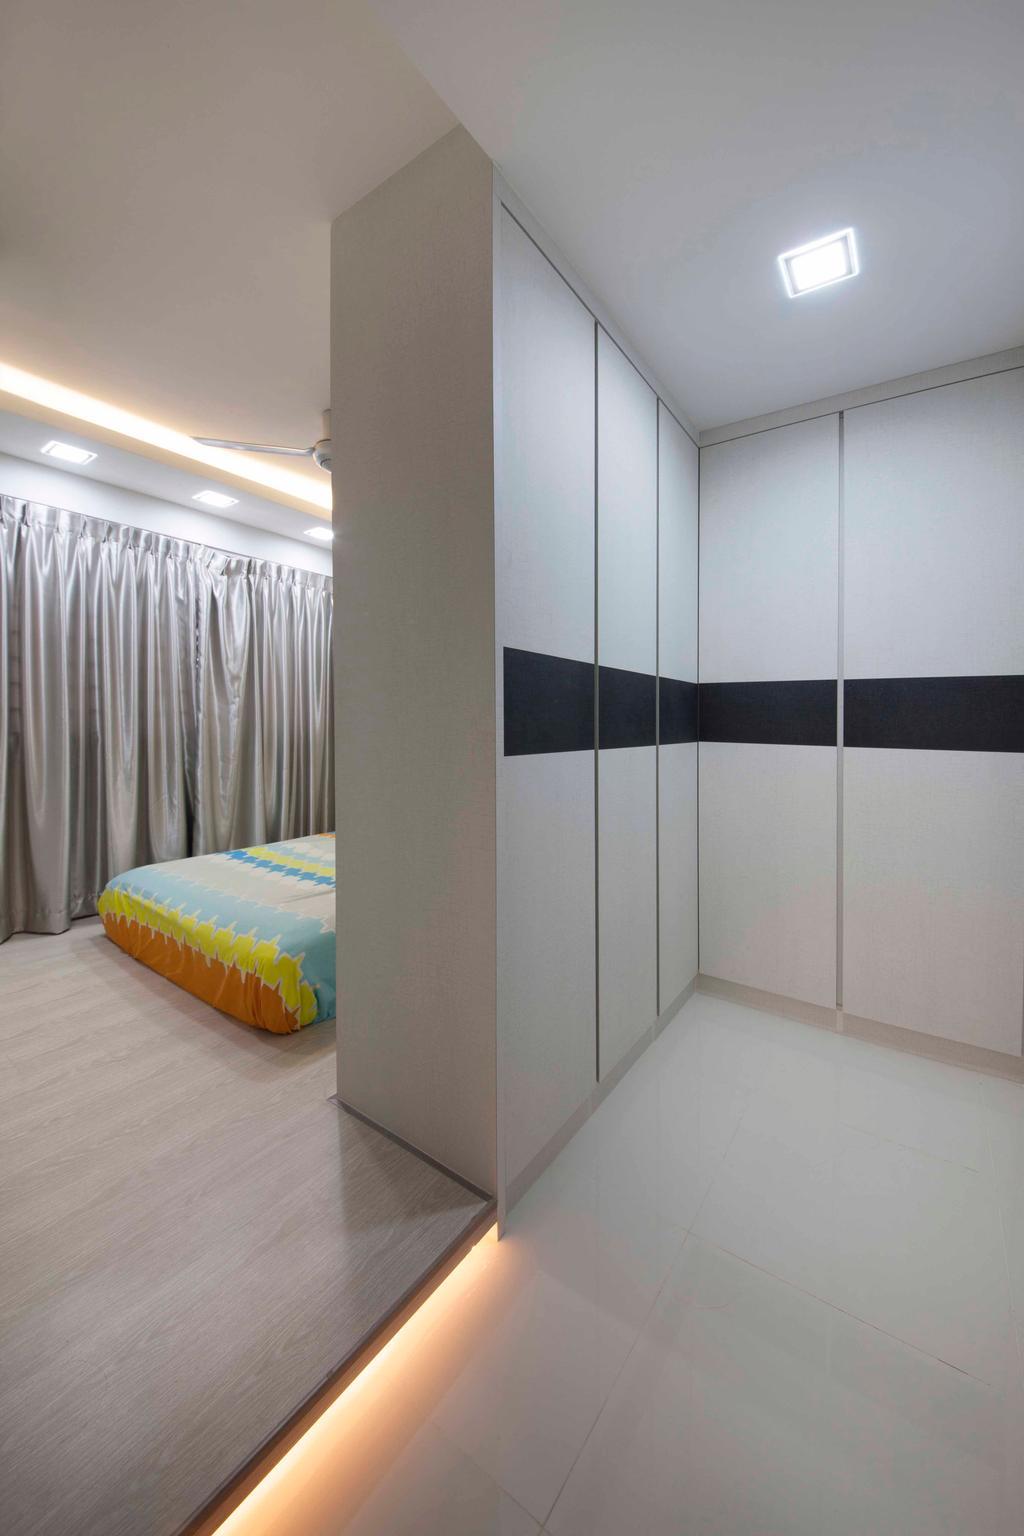 Transitional, HDB, Bedroom, Boon Lay (Block 197B), Interior Designer, DreamCreations Interior, Platform, Curtains, Wardrobe, Cove Lighting, Tile